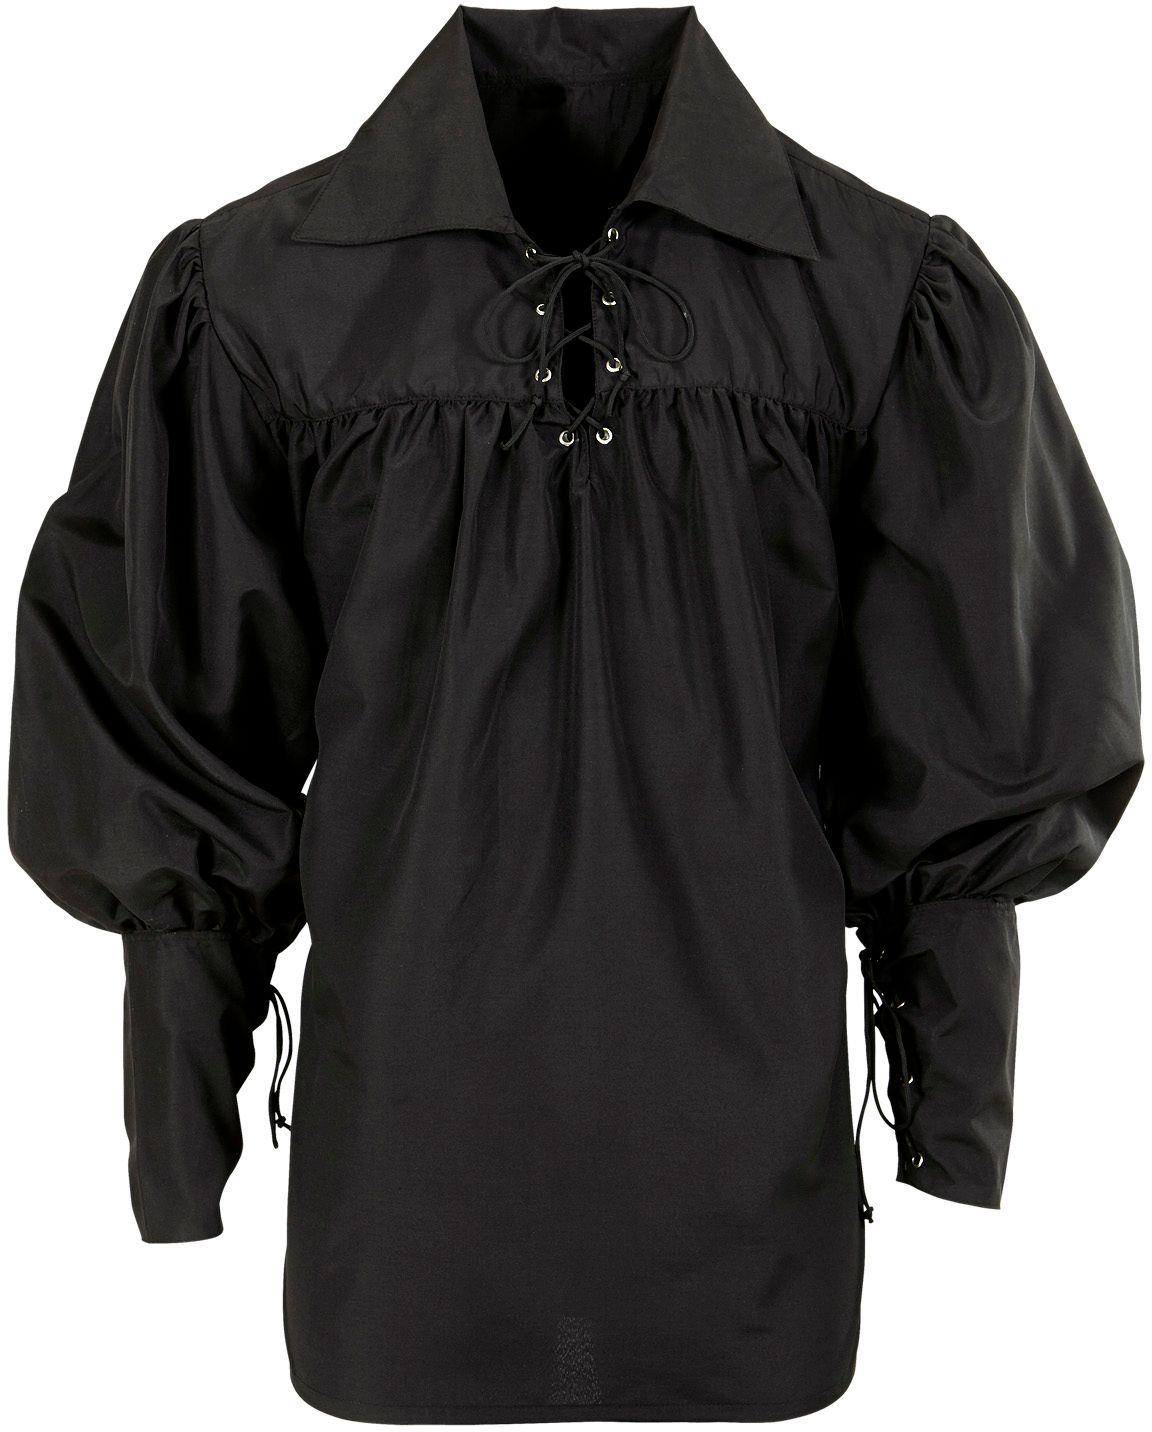 Piraten outfit shirt